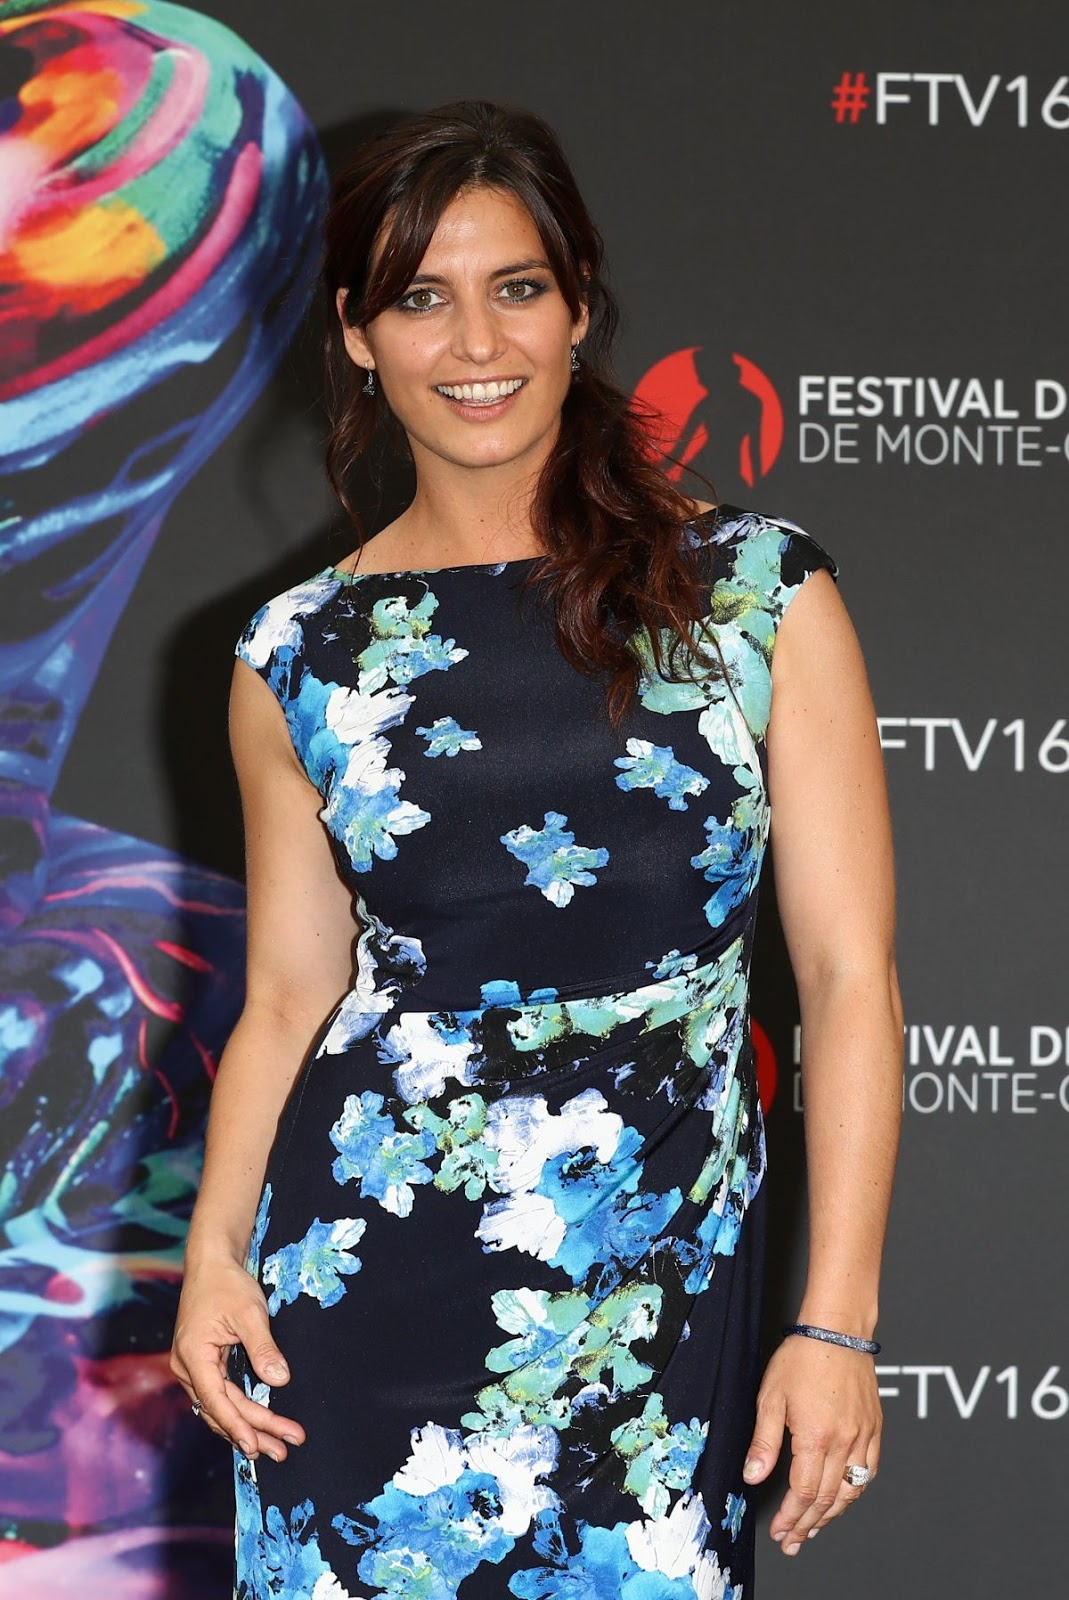 Laetitia Milot At La Vengeance Aux Yeux Clairs Photocall At 56tn Monte Carlo Television Festival